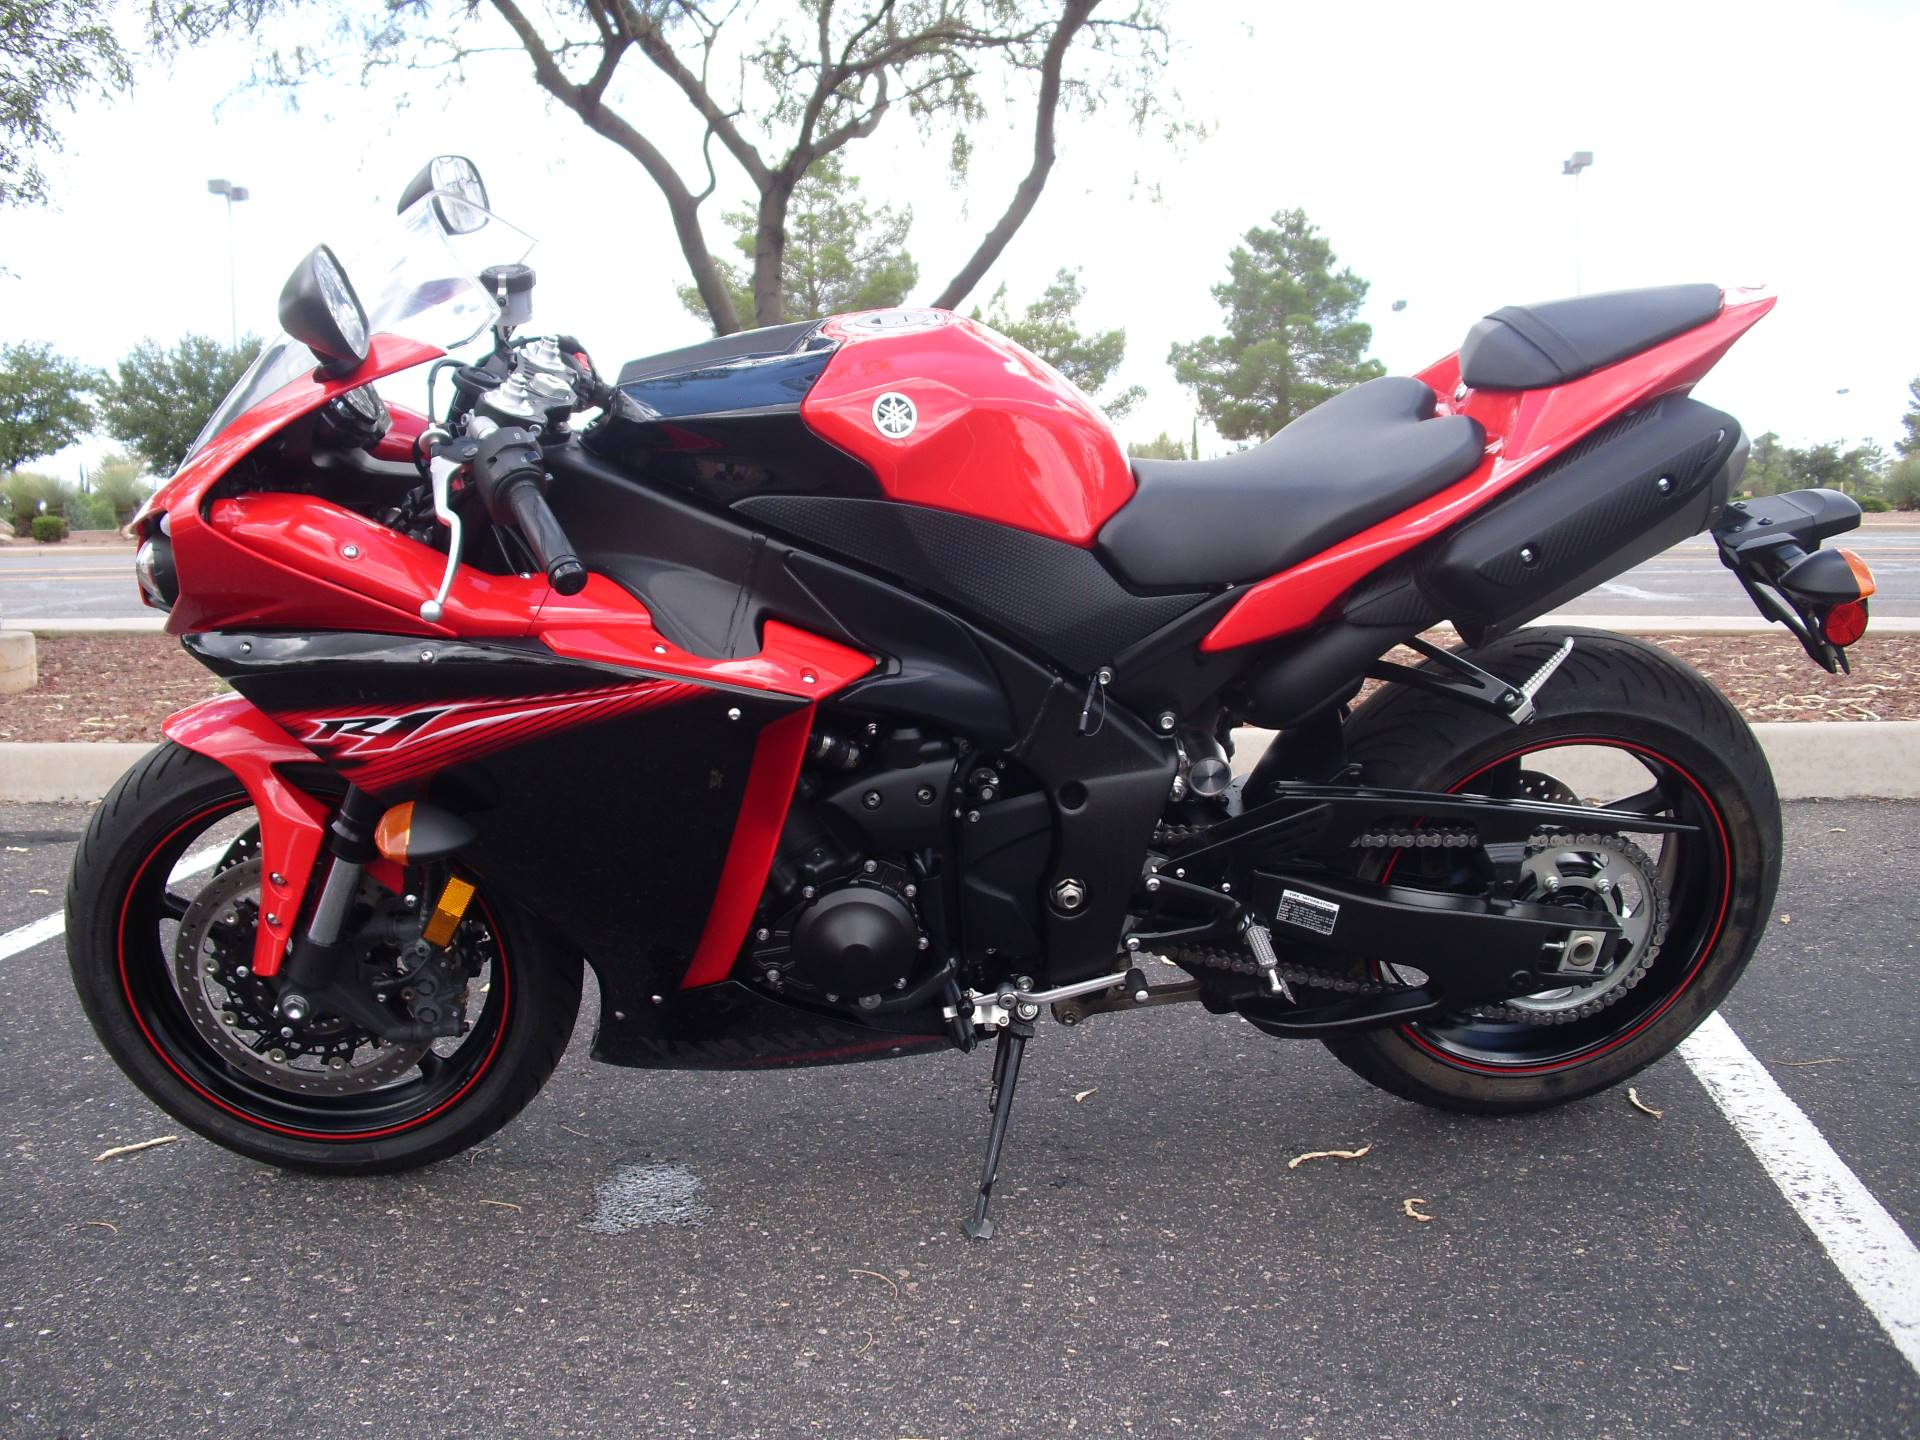 2013 Yamaha YZF-R1 5